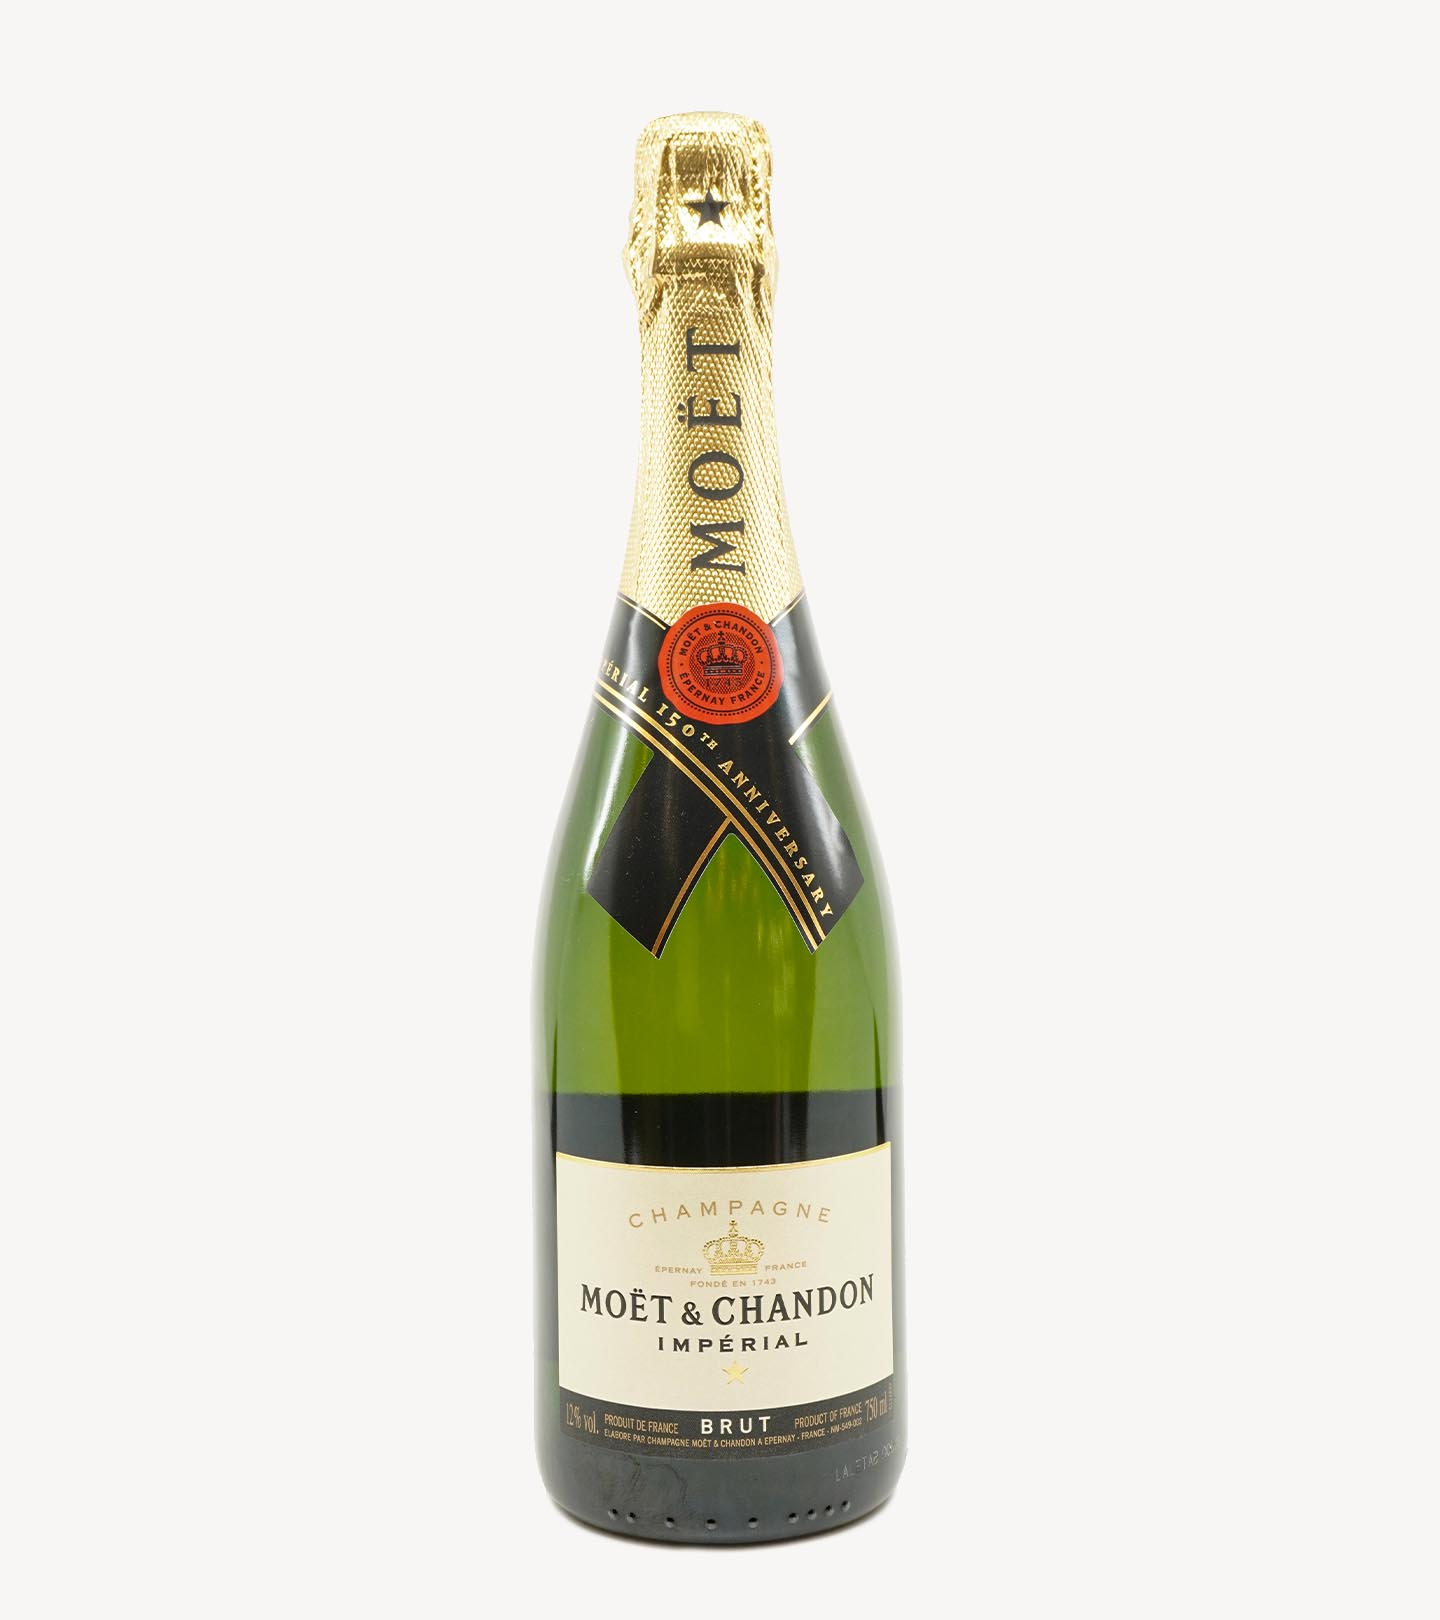 Champagne Moet & Chandon Brut Imperial 75cl